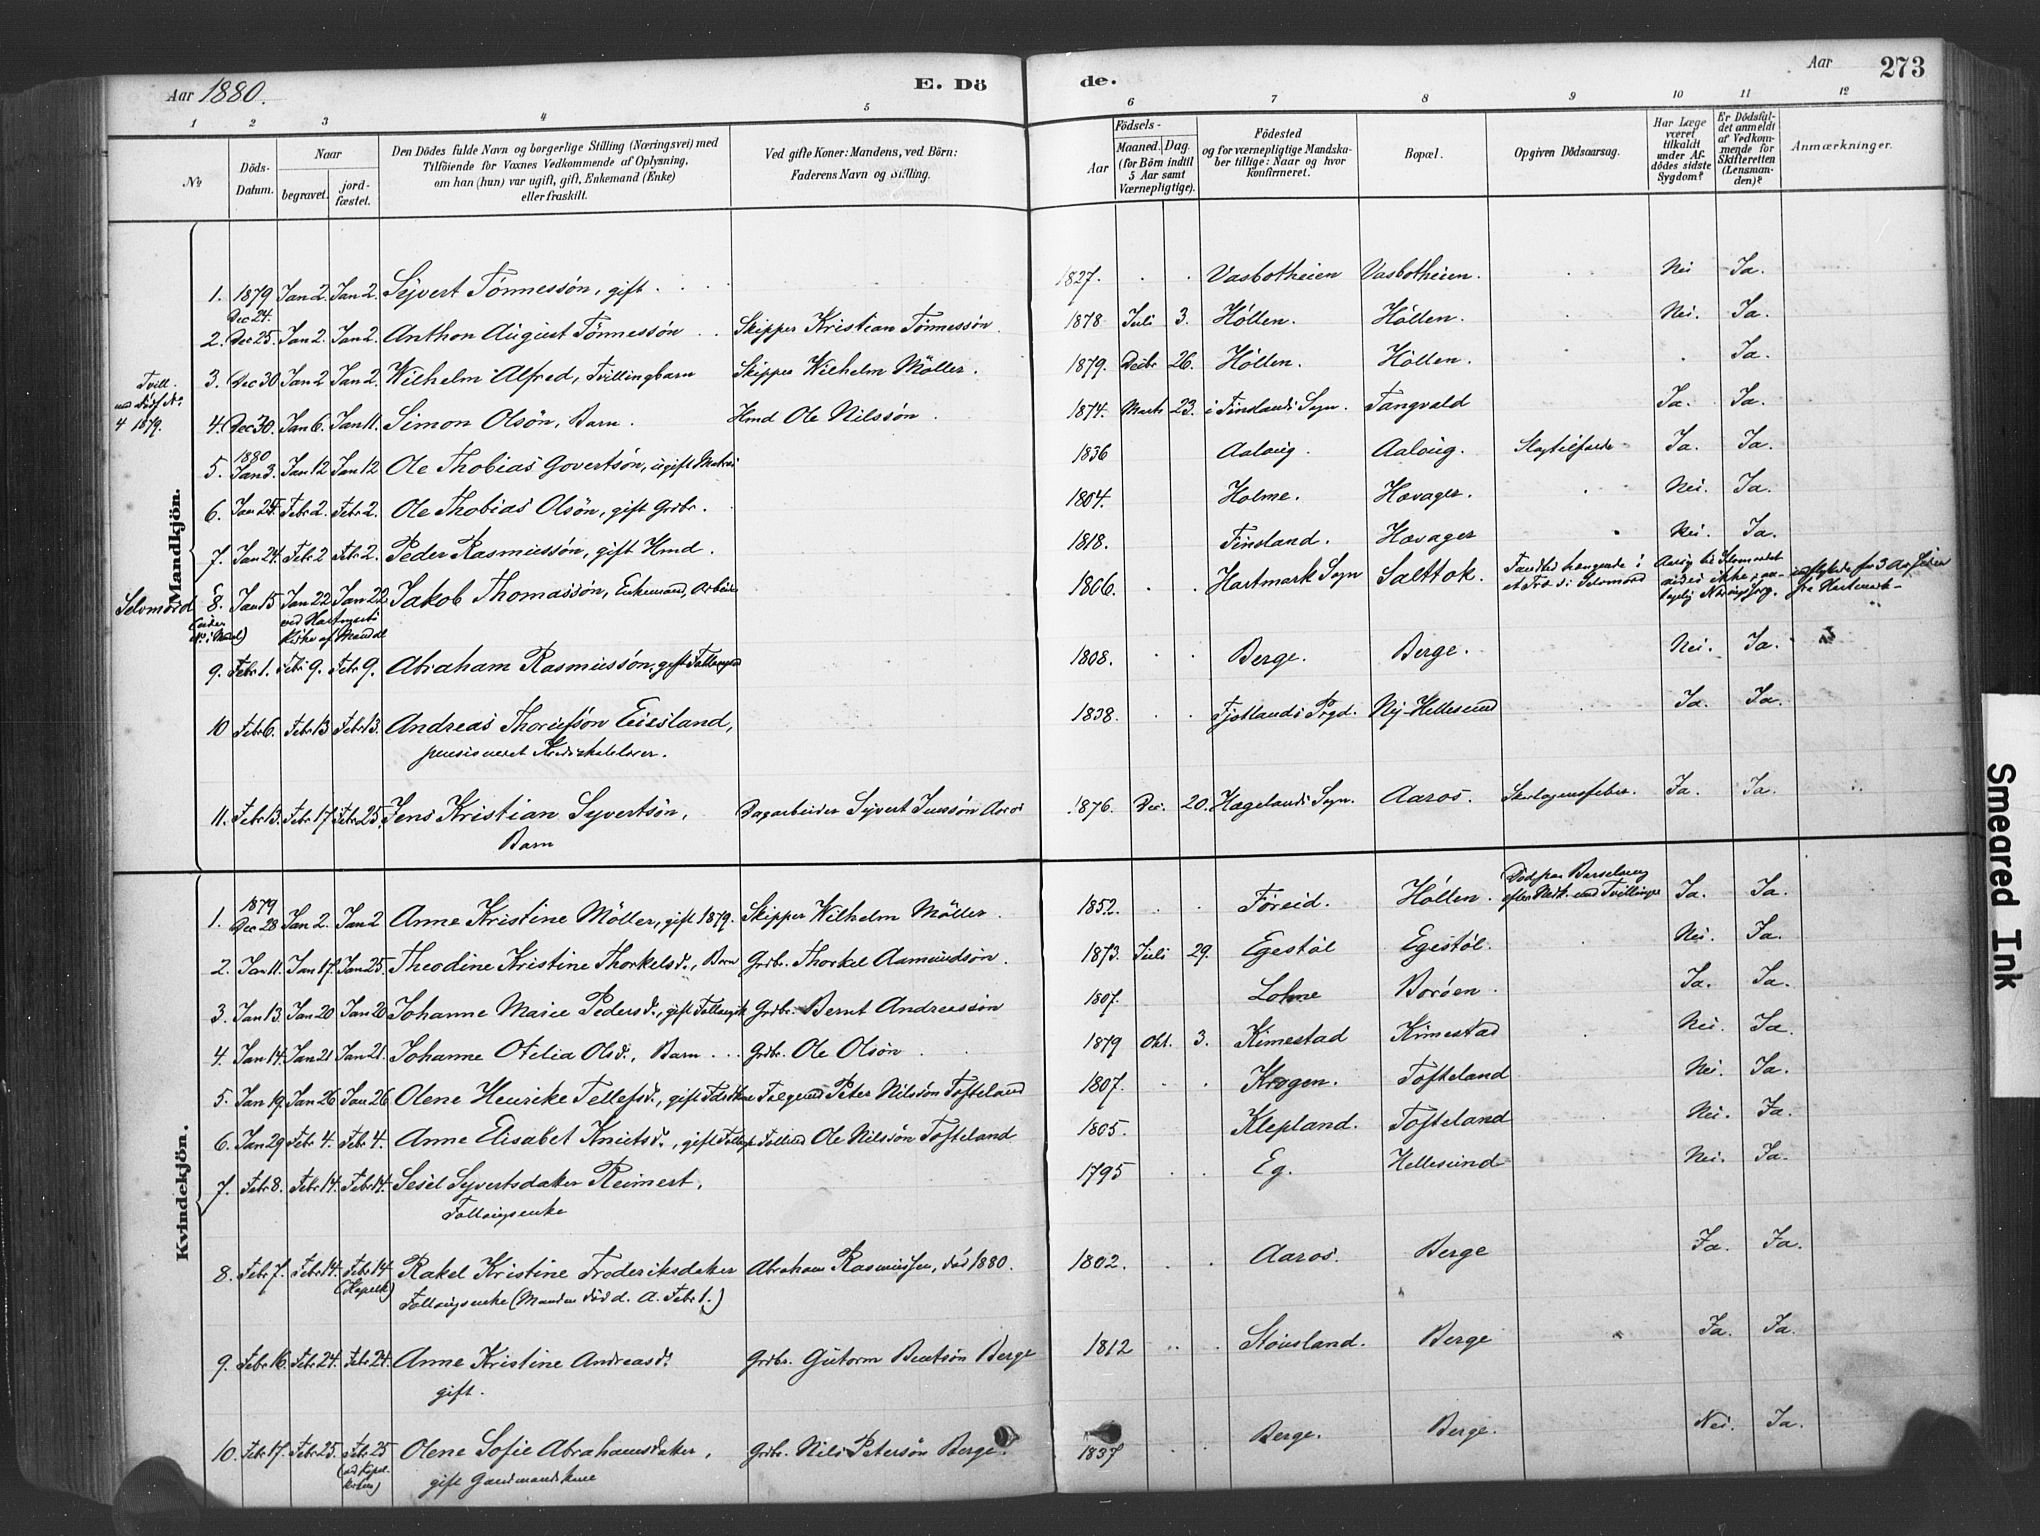 SAK, Søgne sokneprestkontor, F/Fa/Fab/L0012: Ministerialbok nr. A 12, 1880-1891, s. 273